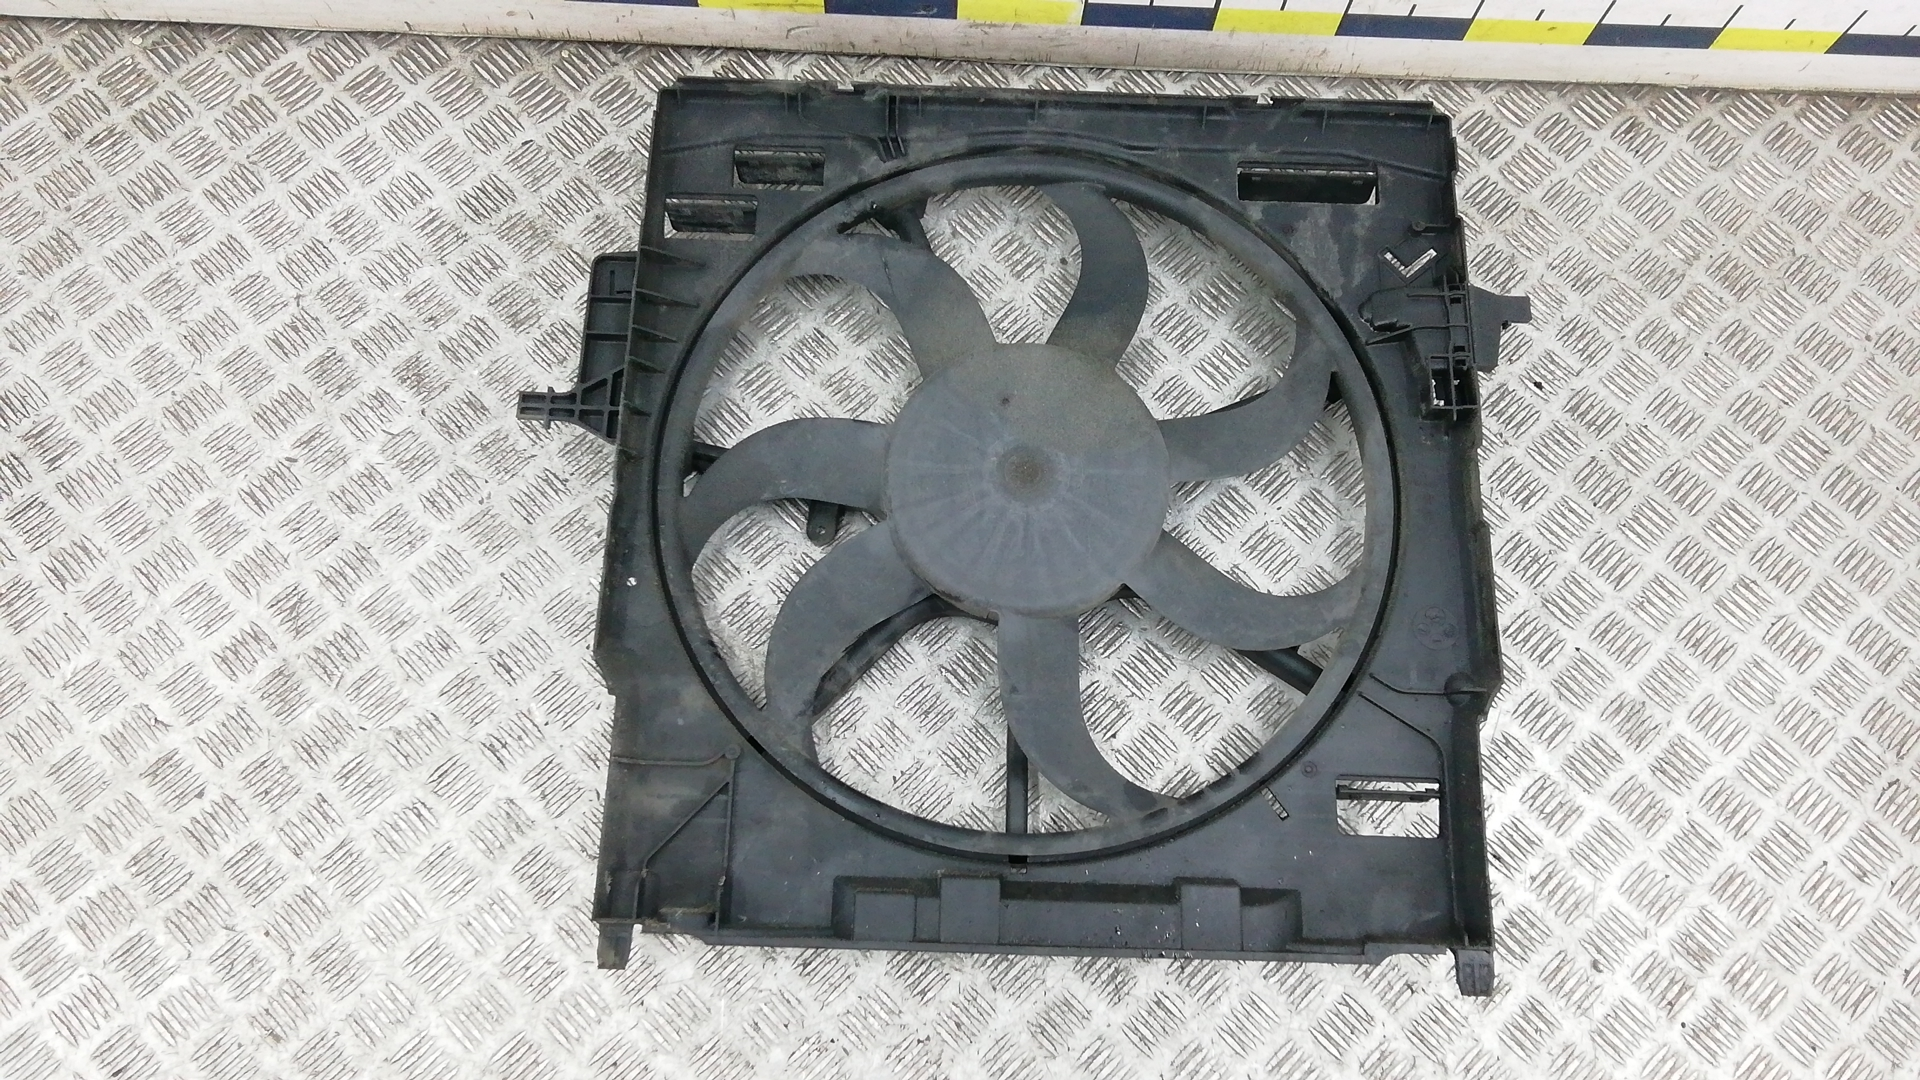 Вентилятор радиатора, BMW, X5 E70, 2007